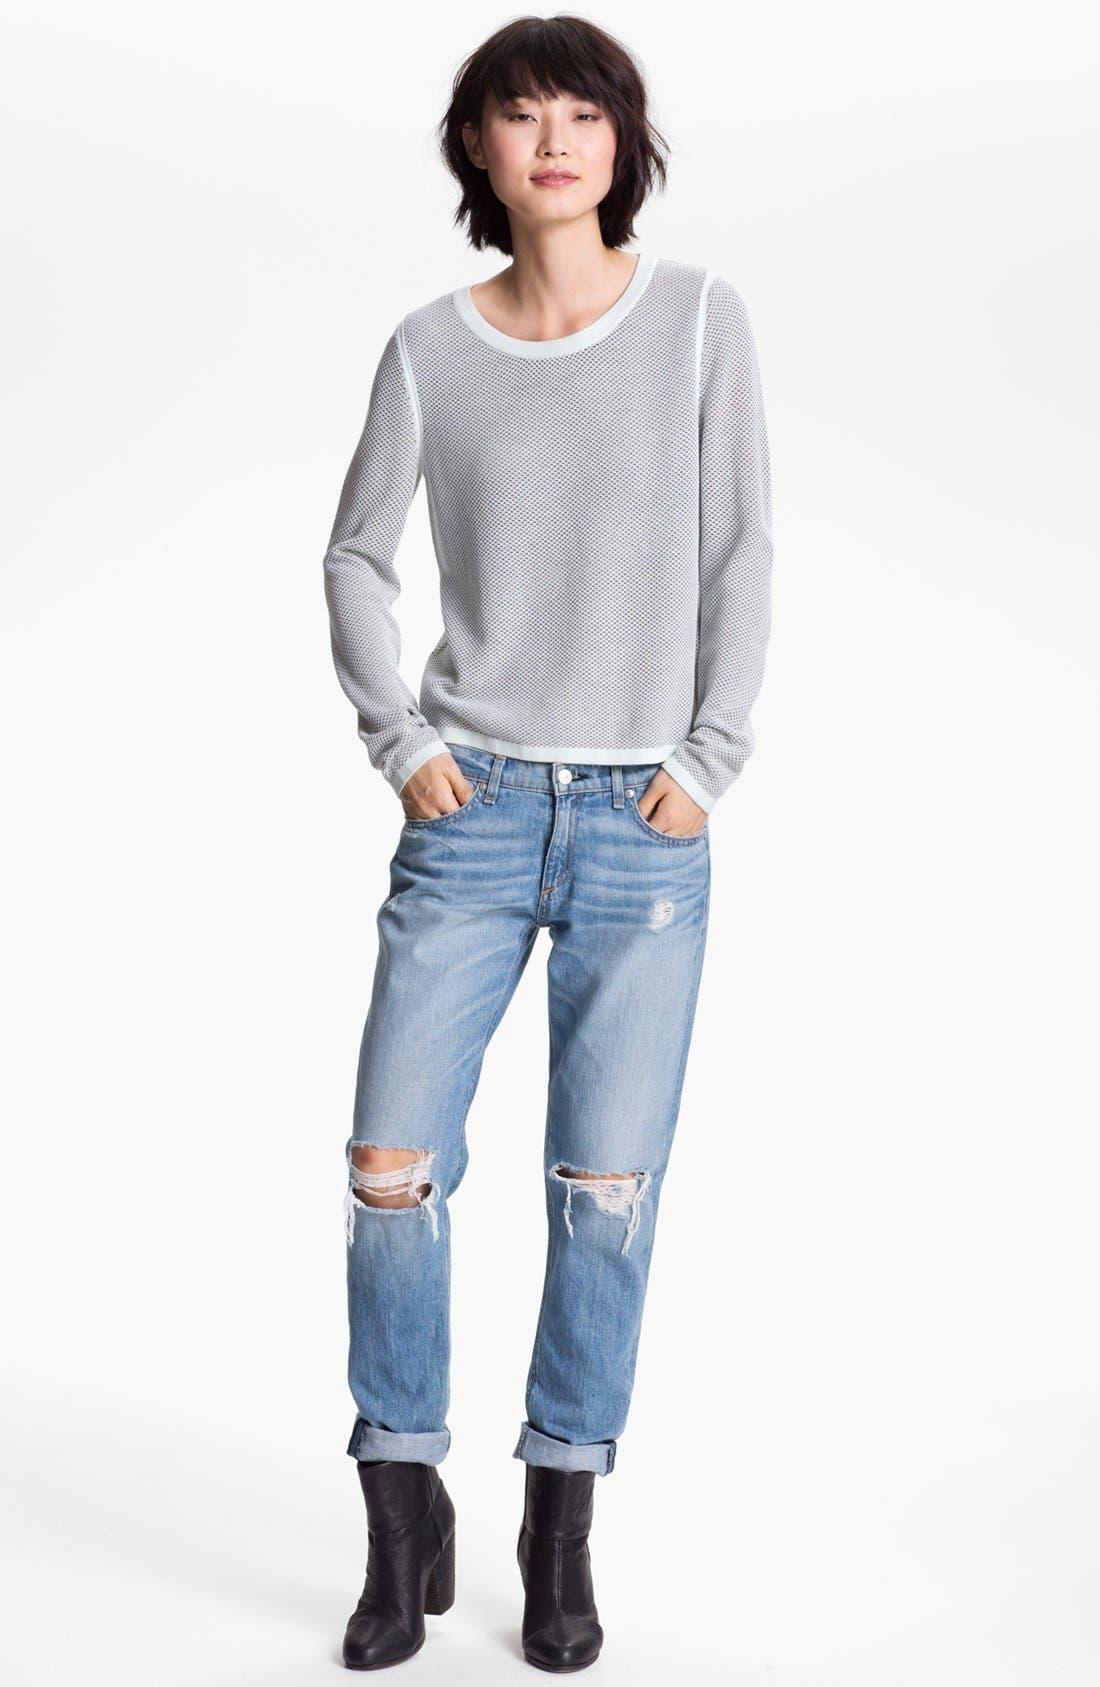 Alternate Image 1 Selected - rag & bone Sweater & rag & bone/JEAN Boyfriend Jeans